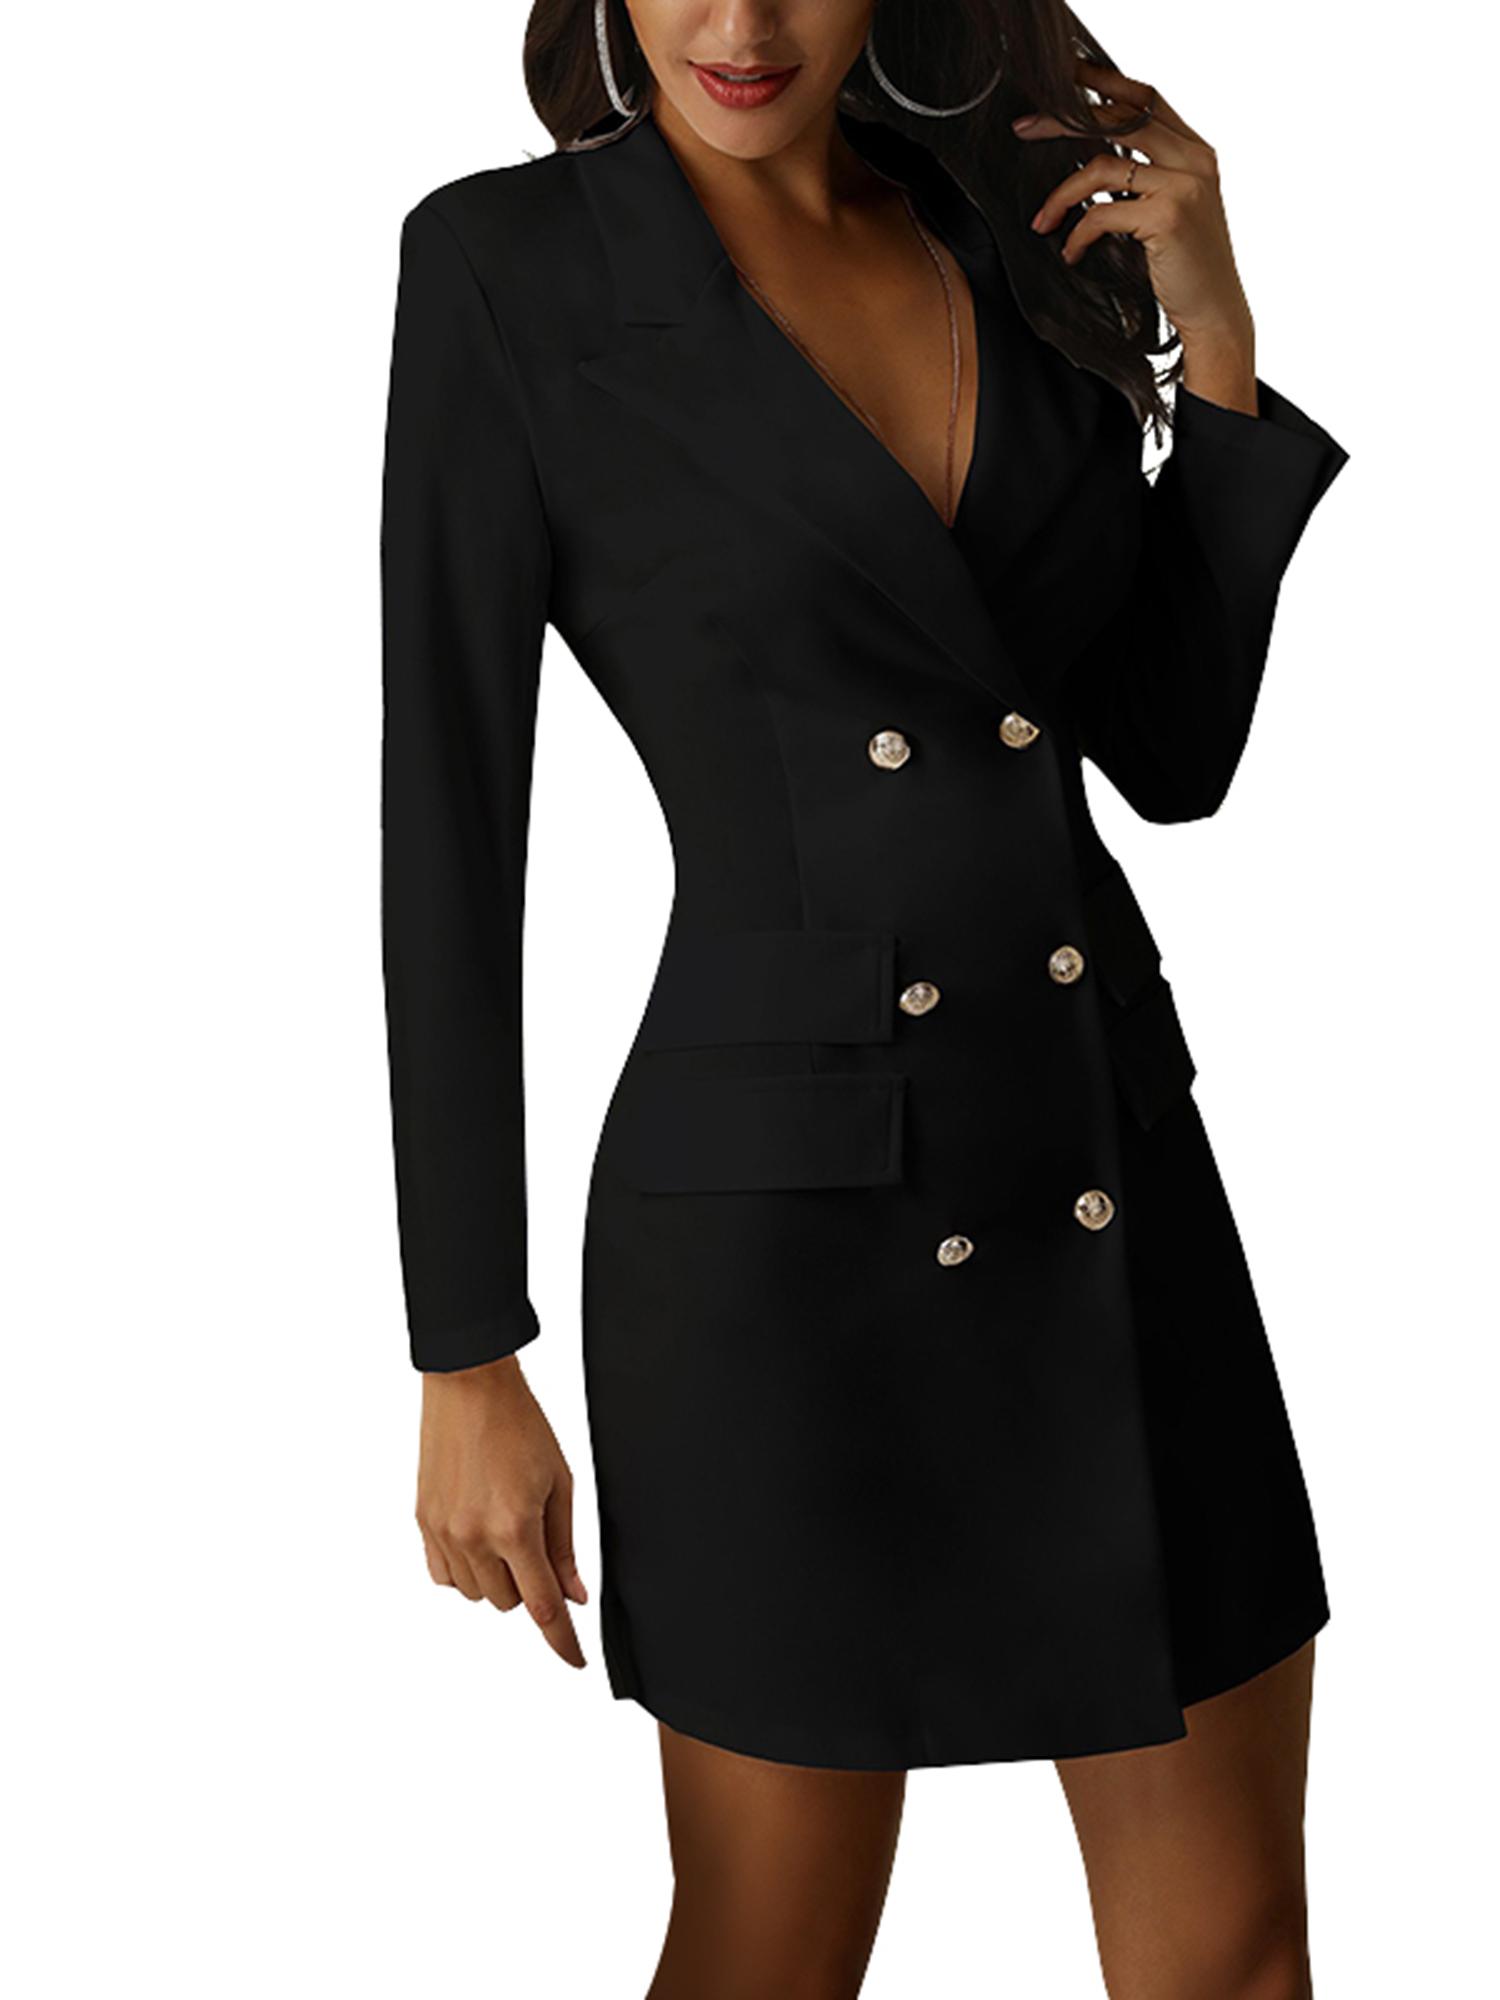 Vintage-Women-Double-Breasted-Plaid-Long-Blazer-Ladies-Jackets-Suits-Coat-Pocket miniatura 17